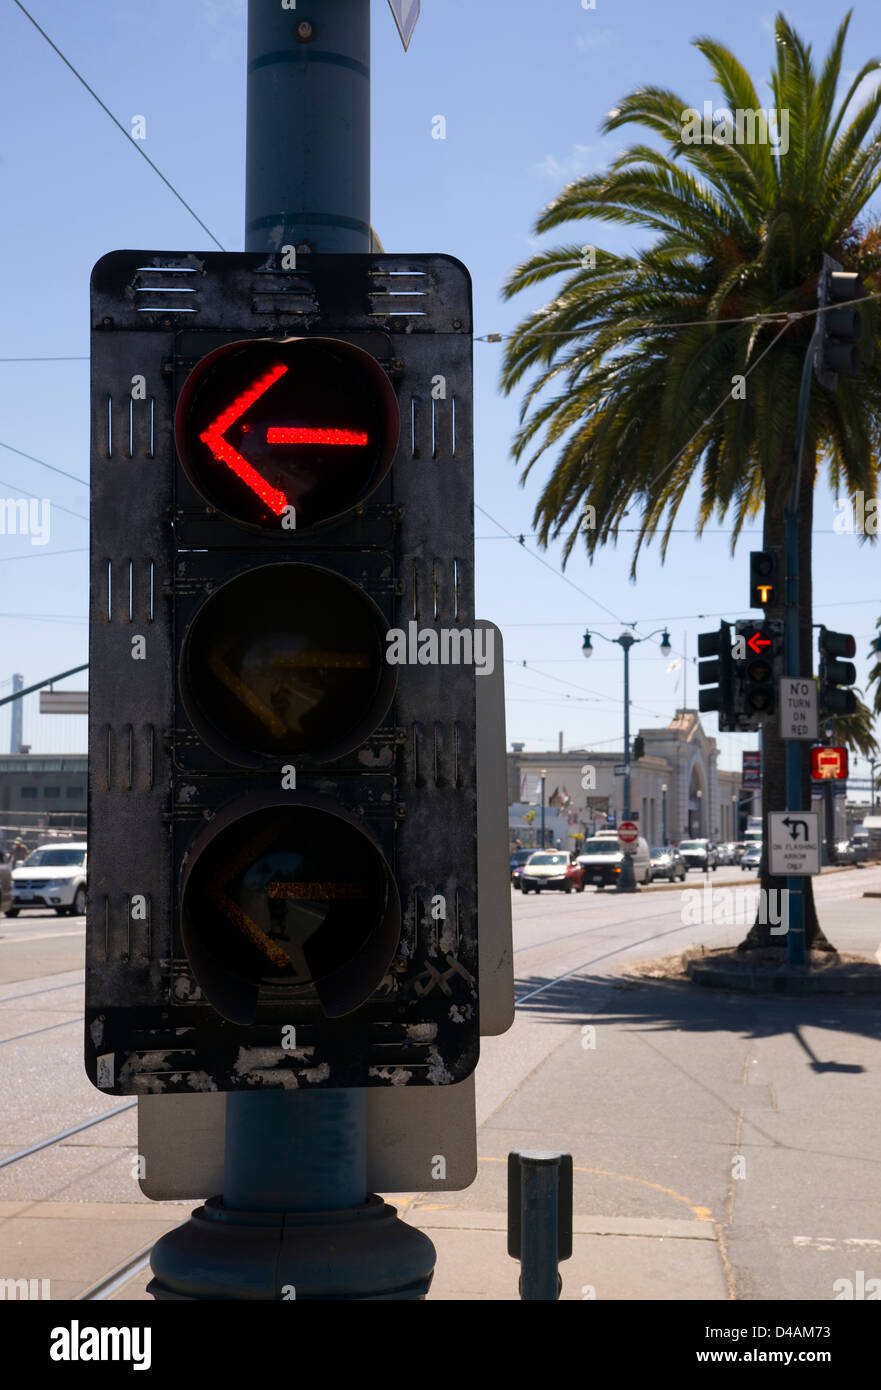 3 Way Left Turn Signal Street Traffic Controller Device